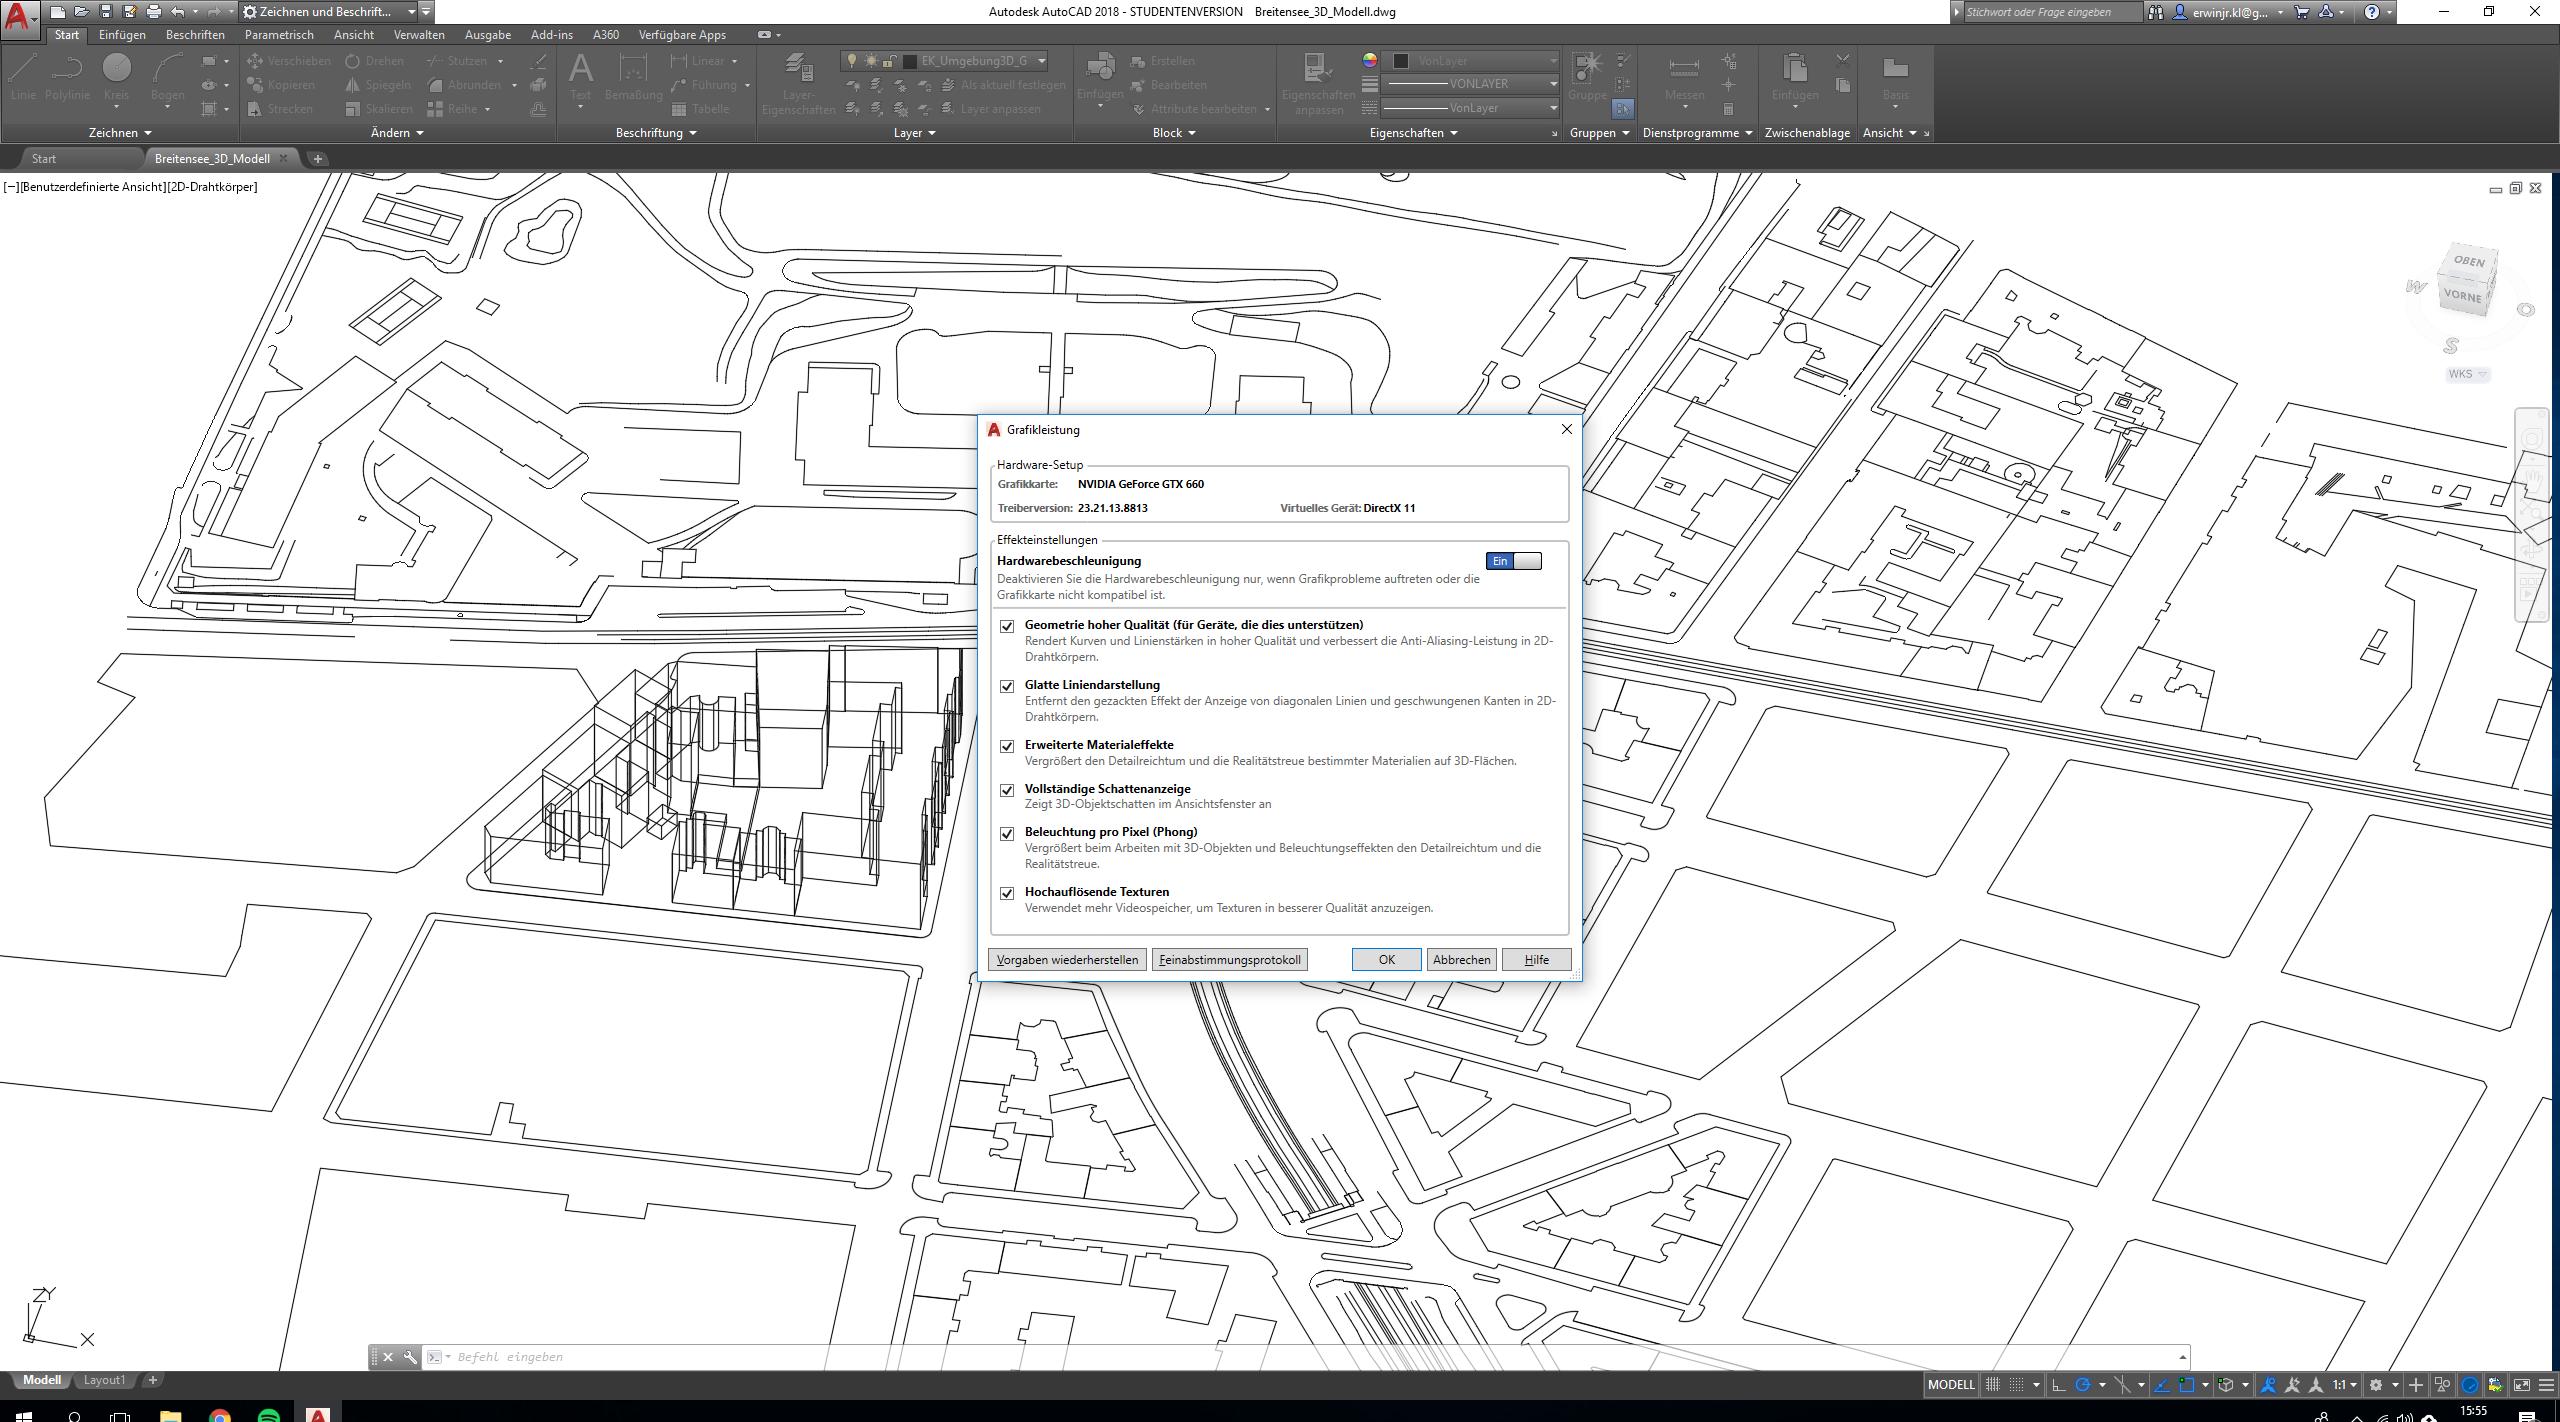 Autodesk Forums